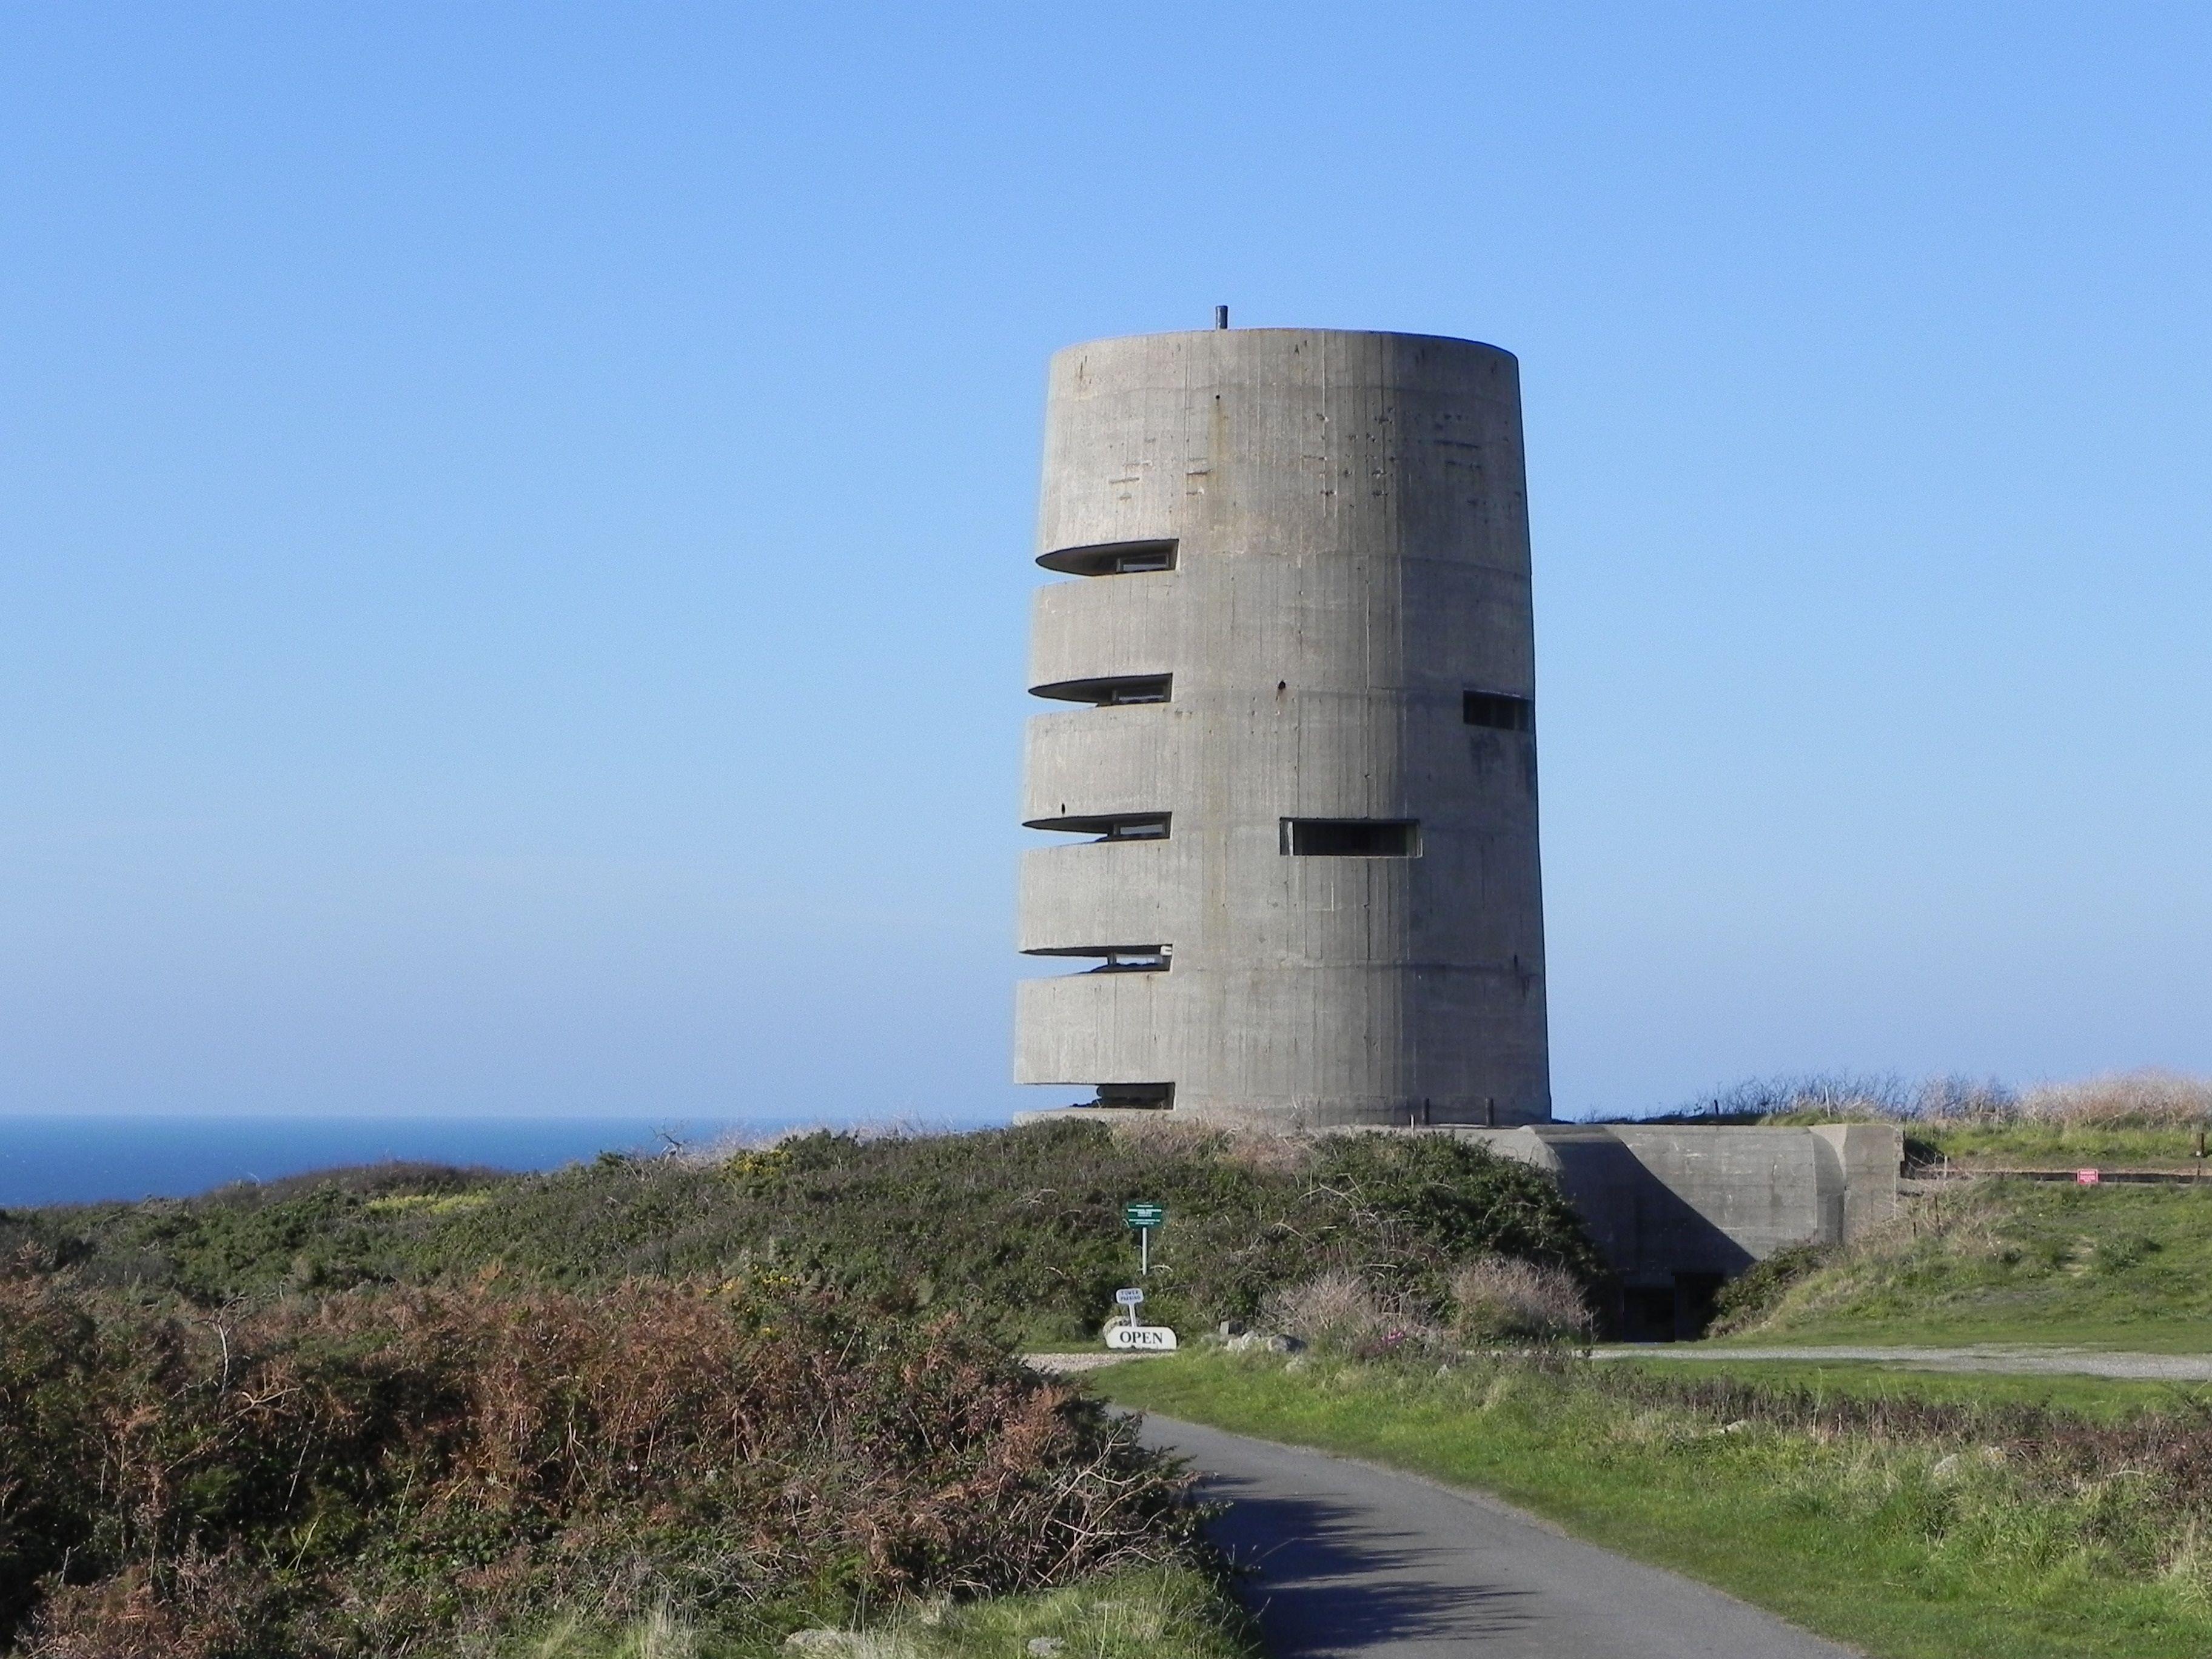 Observation Tower MP3 (Naval range finding tower) - Pleinmont ...